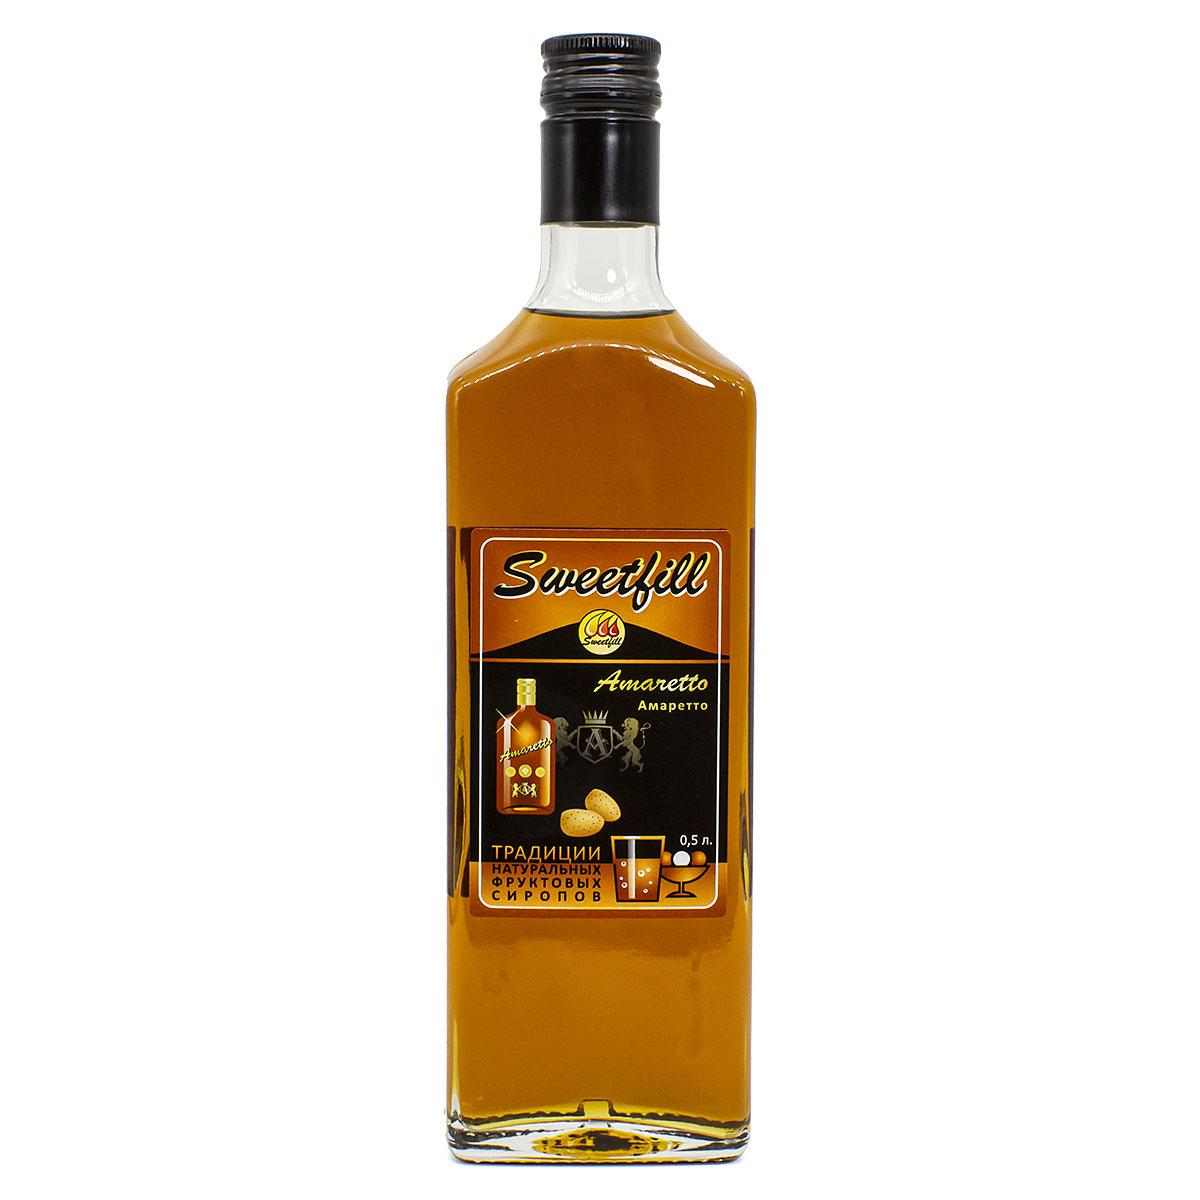 Сироп Sweetfill Амаретто, 0,5 л vedrenne карамель сироп 0 7 л